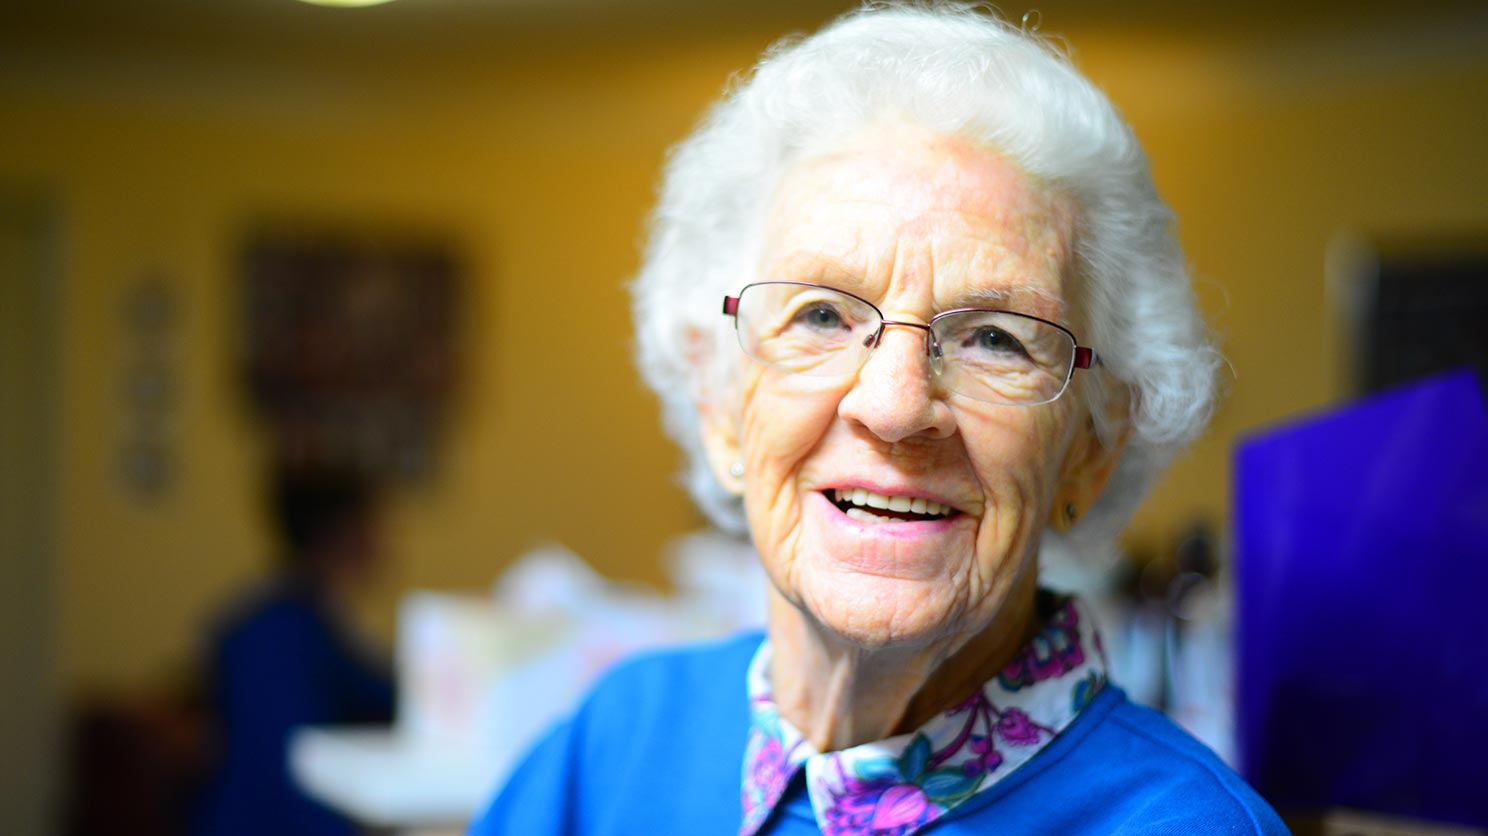 Cheerful senior